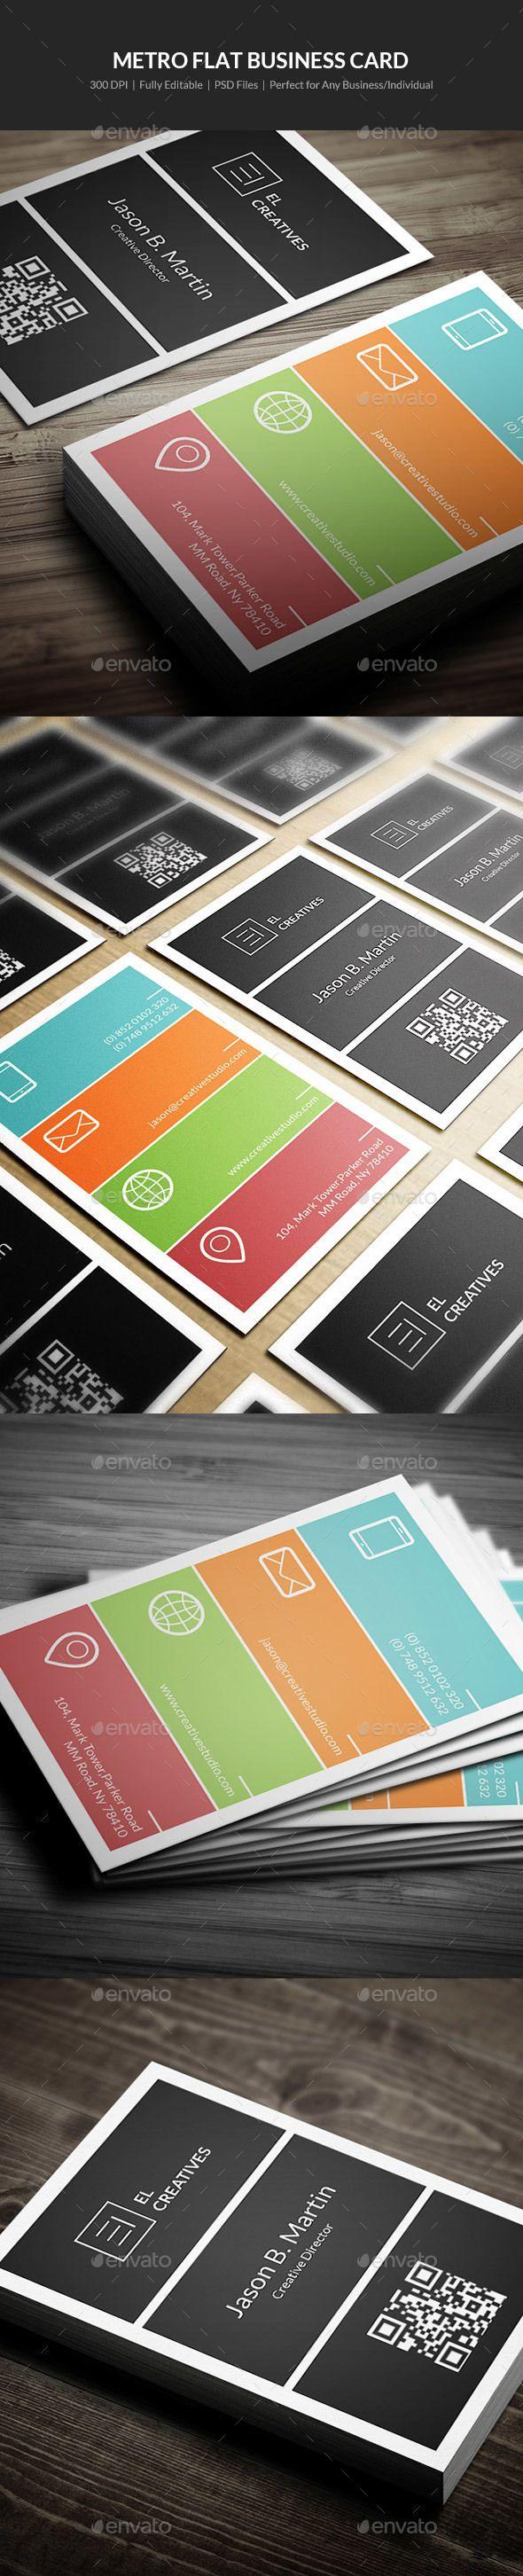 12 Best Business Cards Images On Pinterest Carte De Visite